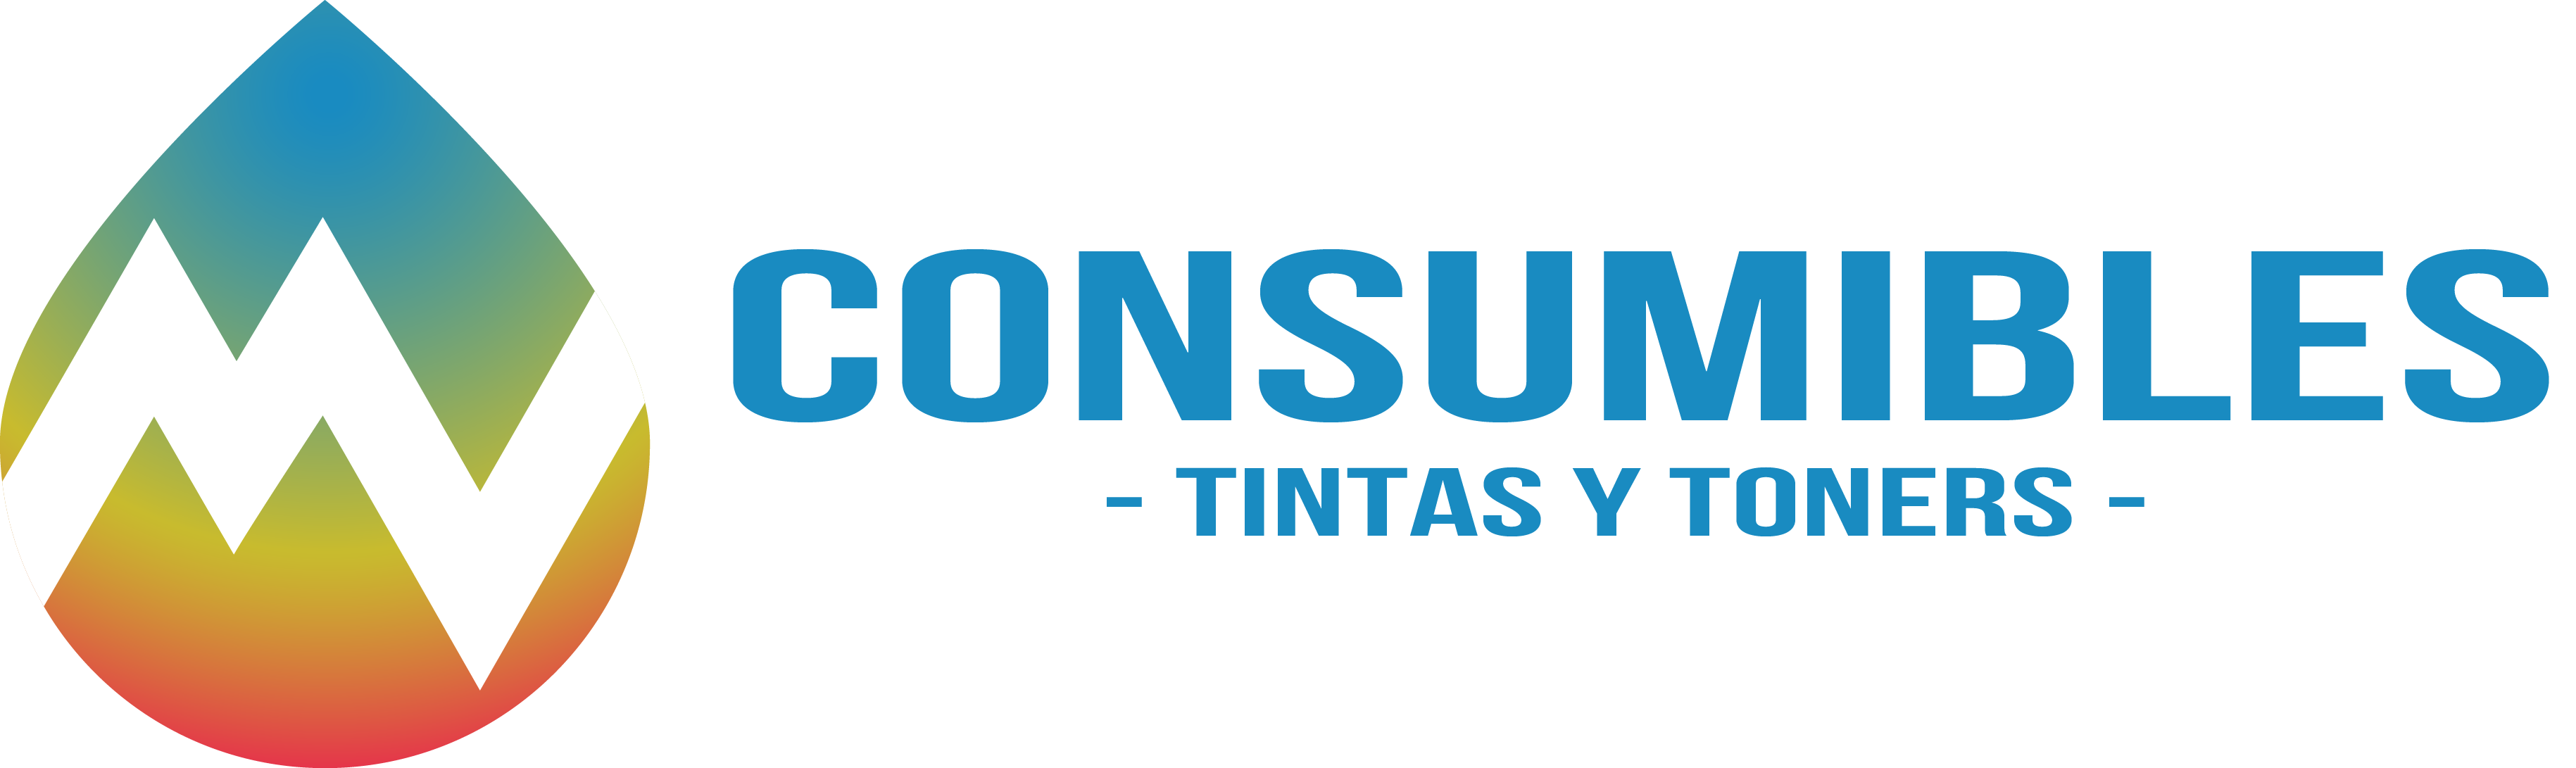 MV Consumibles